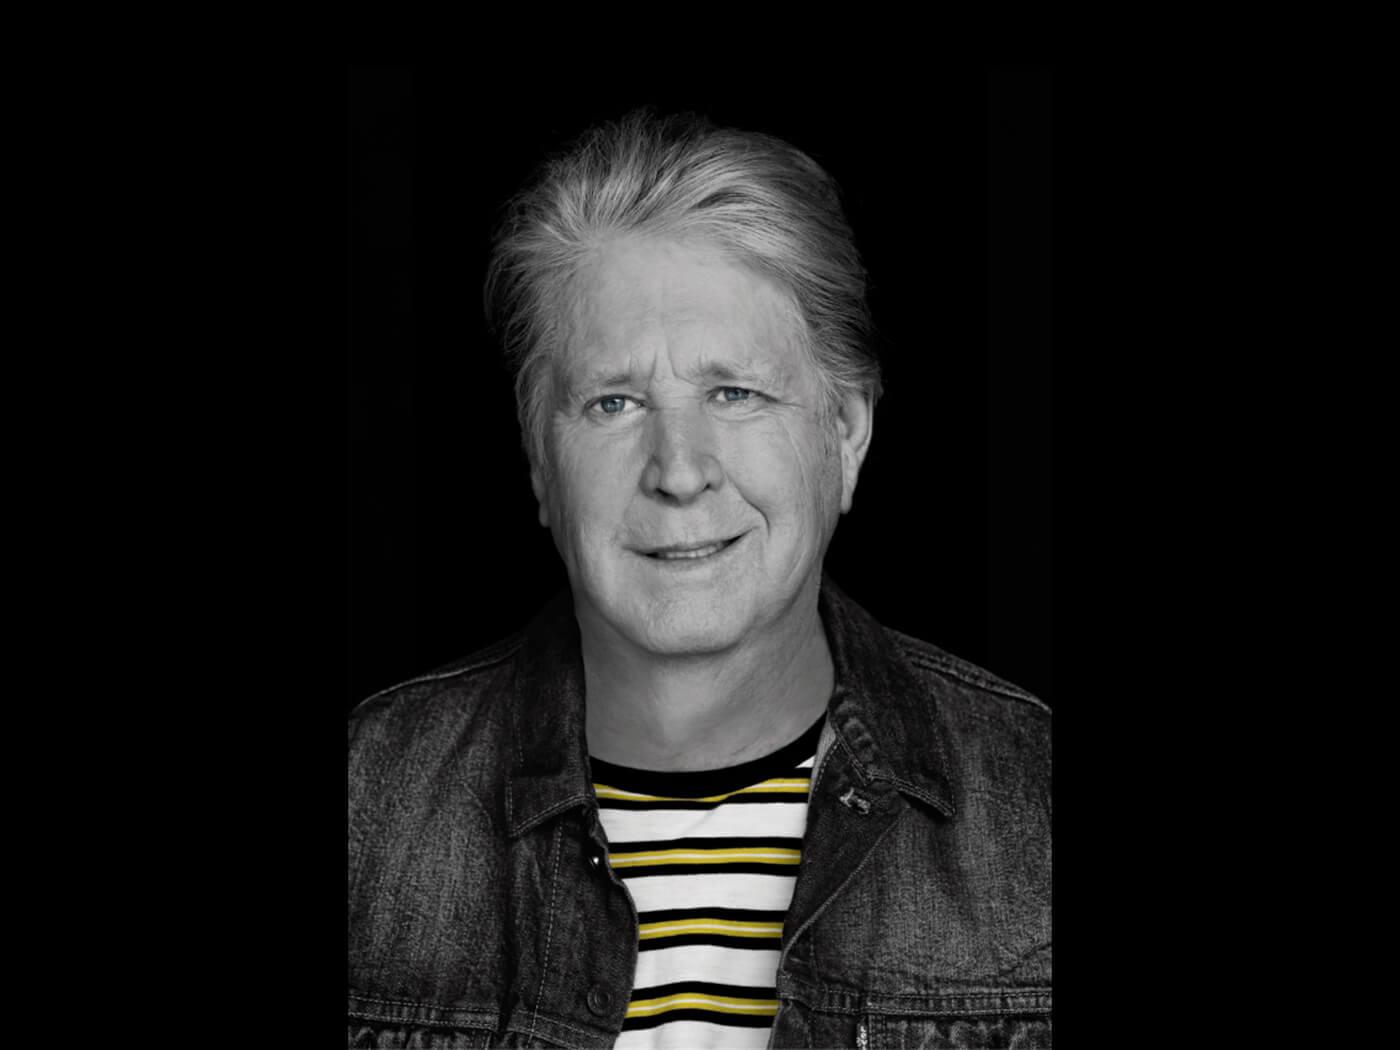 Brian Wilson announces Good Vibrations greatest hits tour